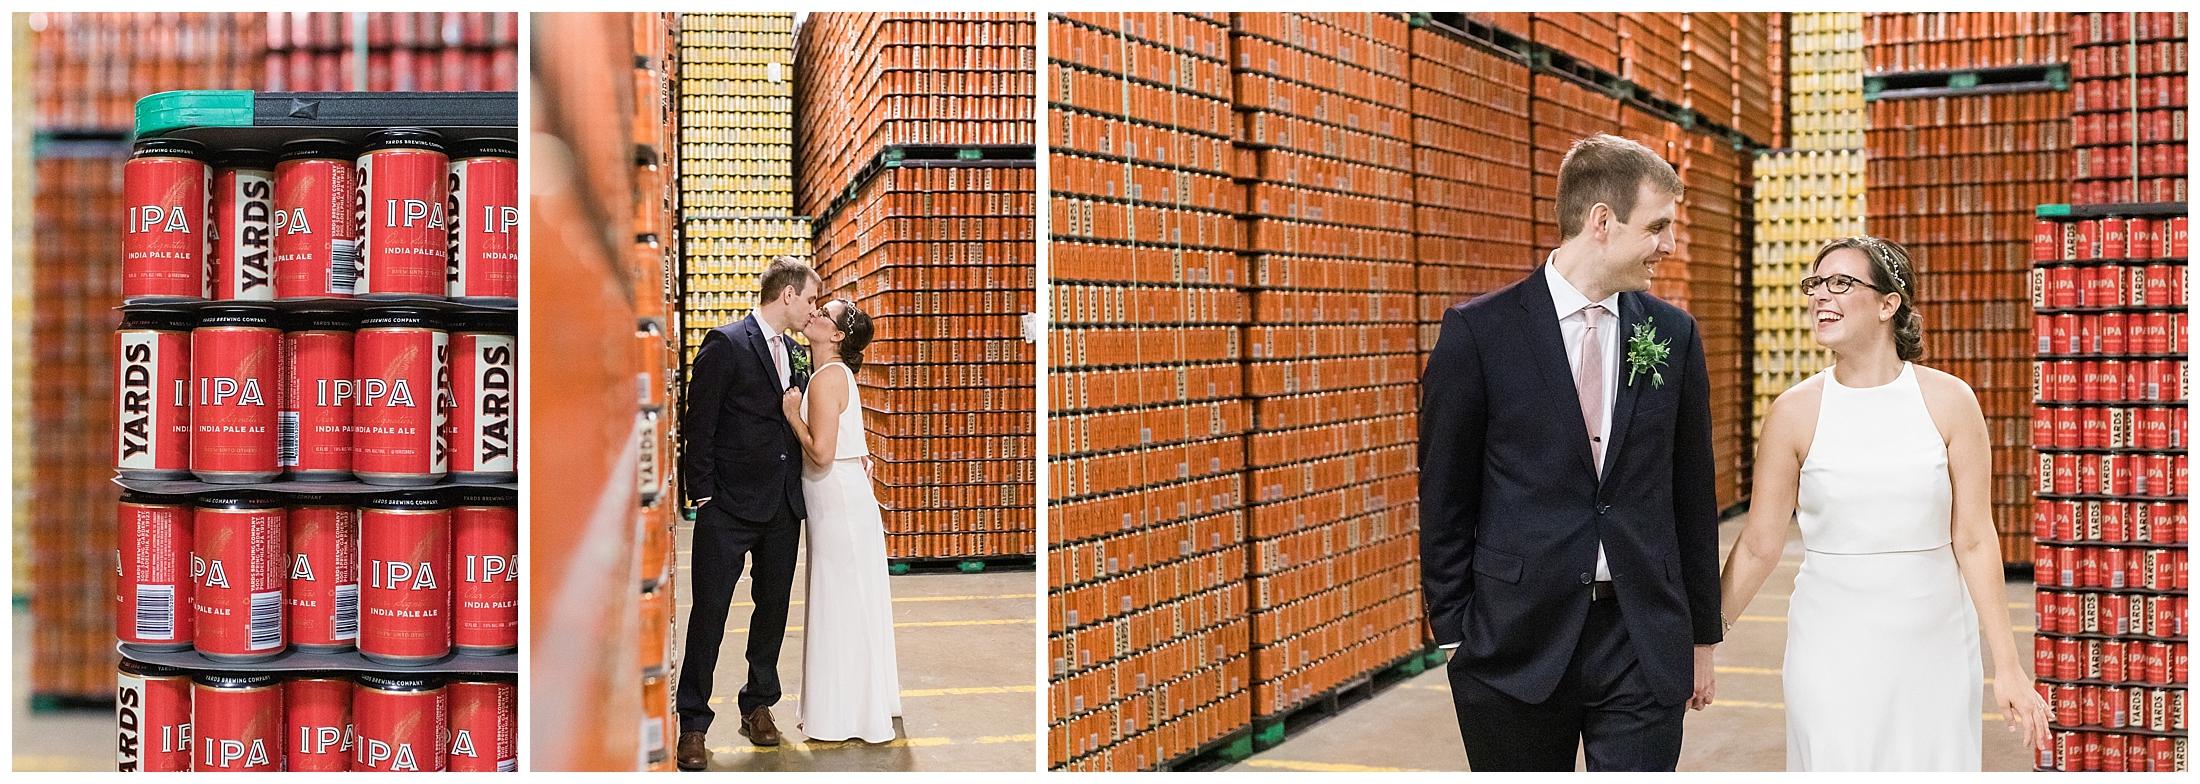 Philadelphia-Wedding-Brewery-Wedding-40.jpg